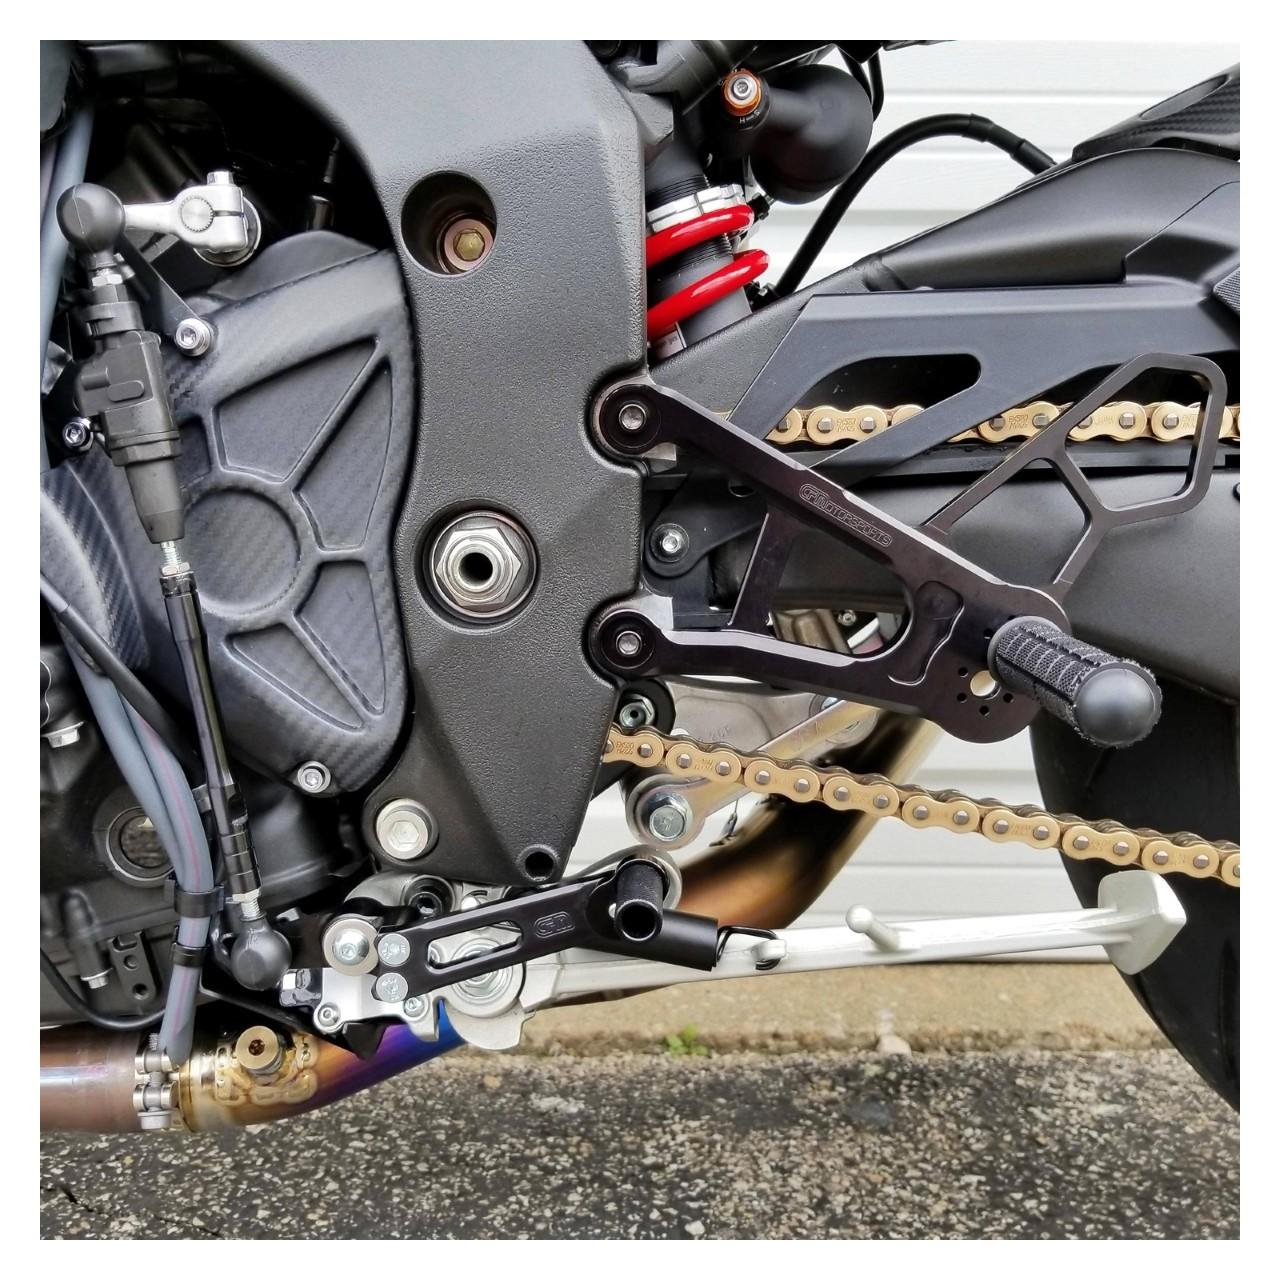 Kawasaki Motorcycle Parts 2003 Zx600e11 Zzr600 Fuel Pump Diagram